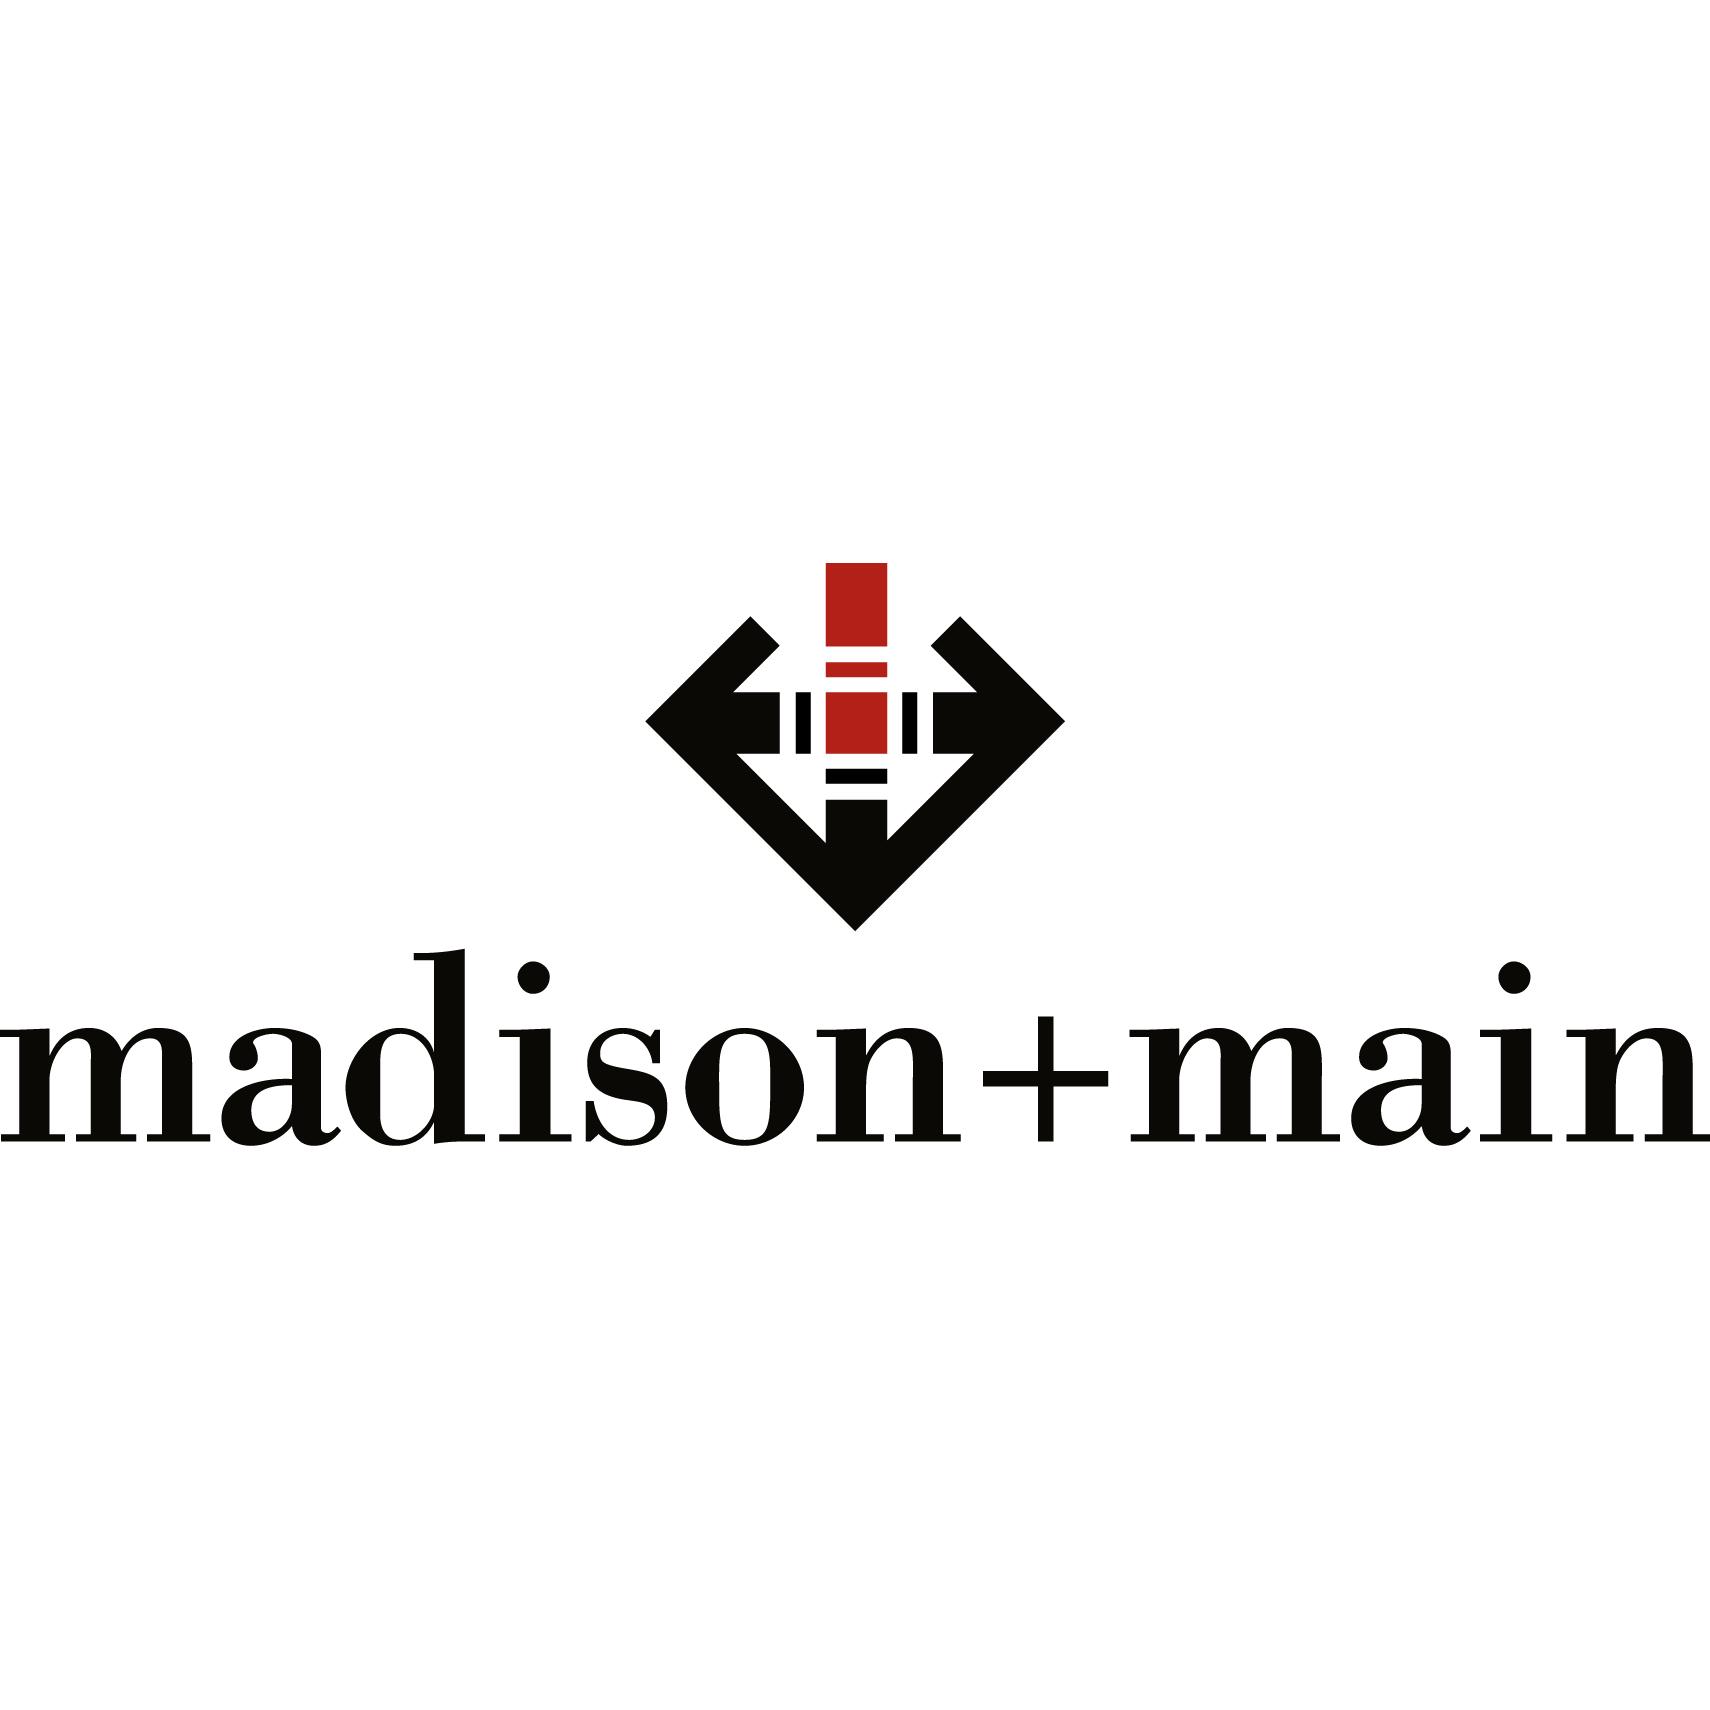 Madison+Main